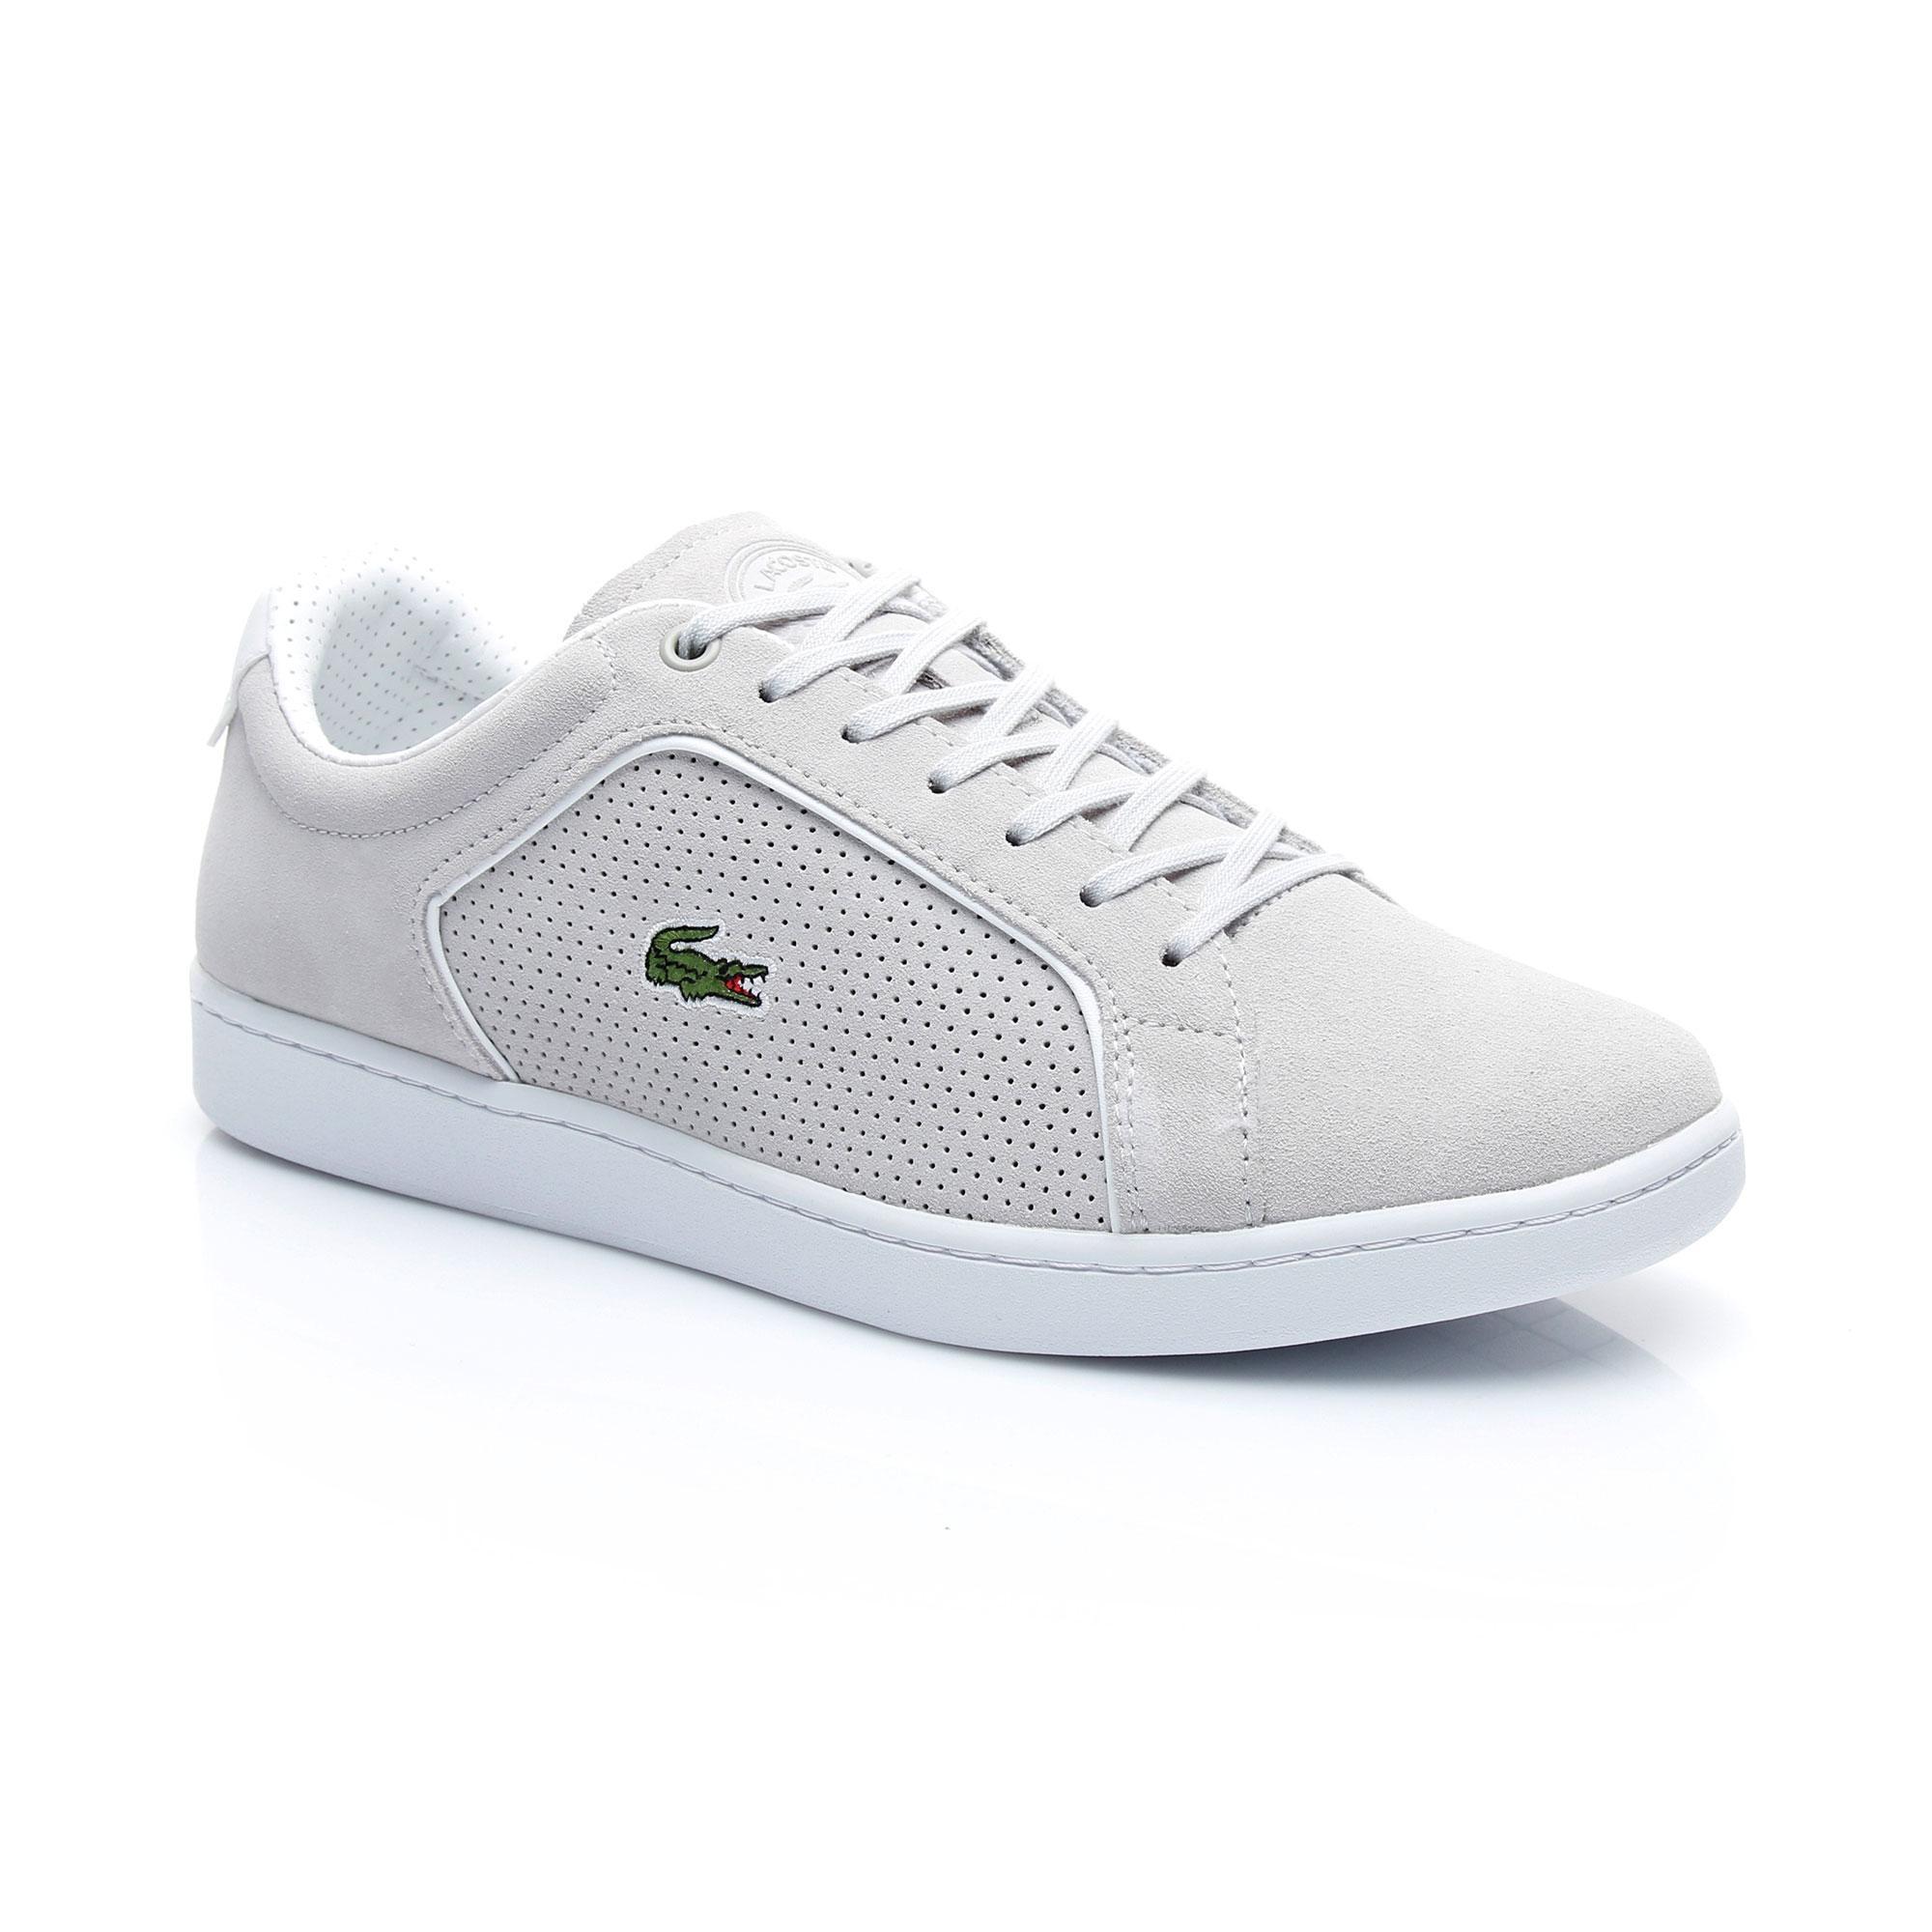 Lacoste Erkek Carnaby Evo 318 9 Açık Gri Sneaker